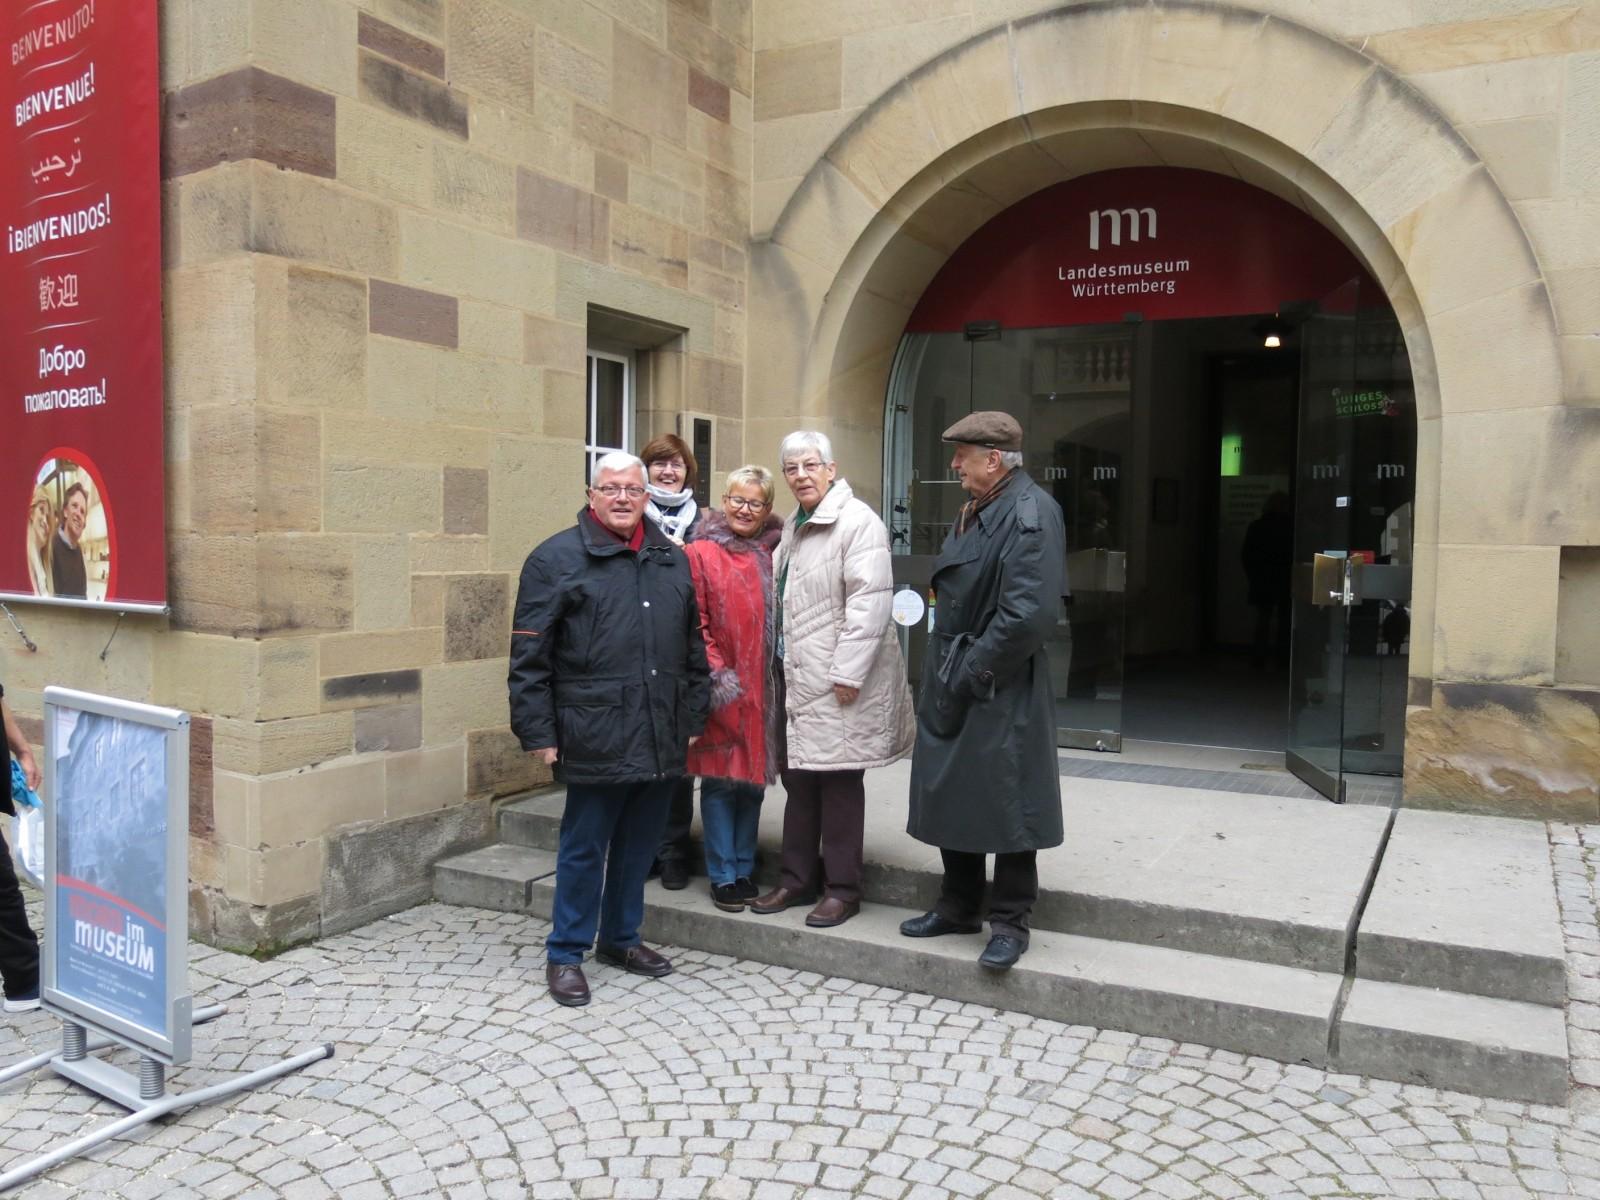 2017_02_08 Stuttgart, Landesmuseum